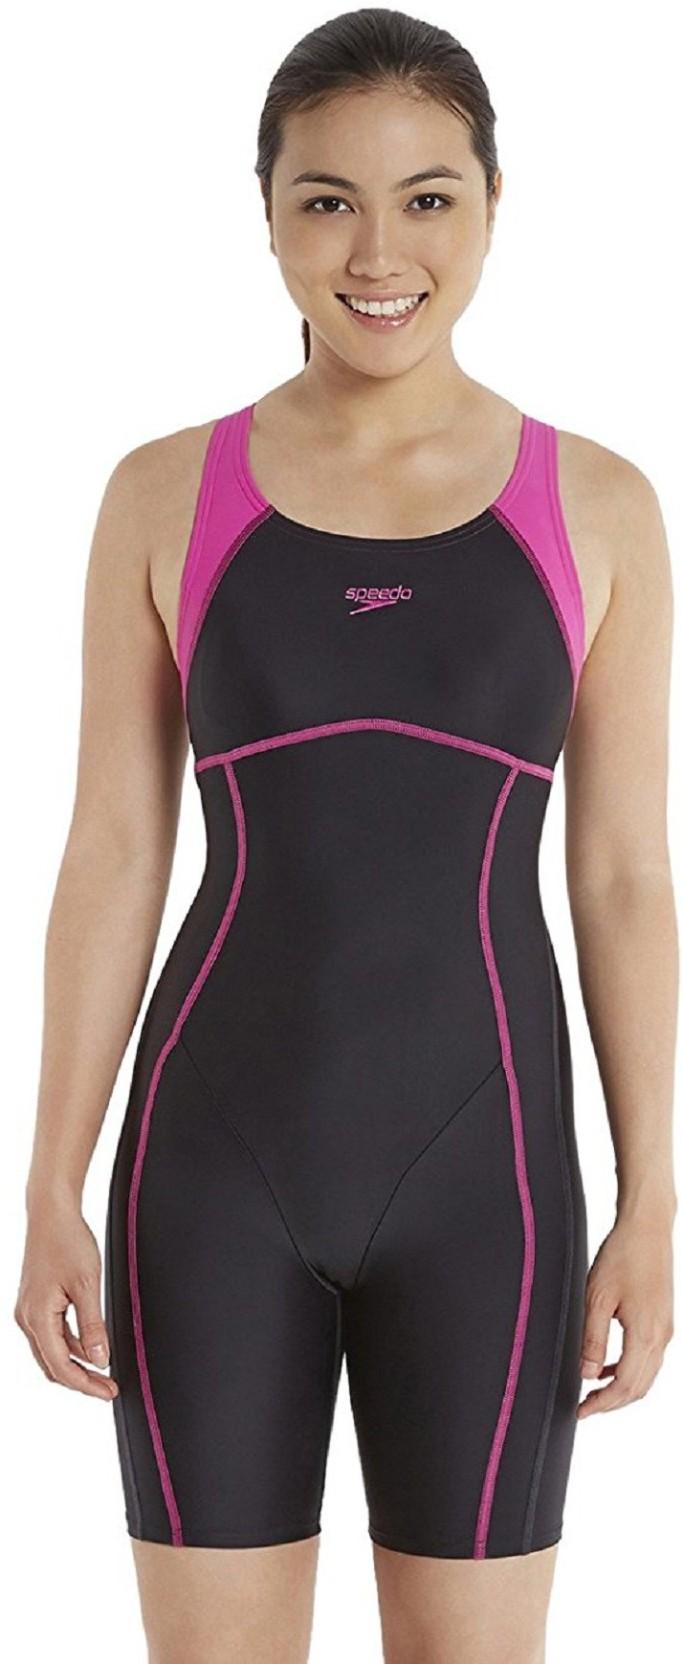 9649d55ee22 Speedo SPEEDO AF ESSENTIAL SPLICED LEGSUIT - BLACK/ECSTATIC Printed Women  Swimsuit. Home